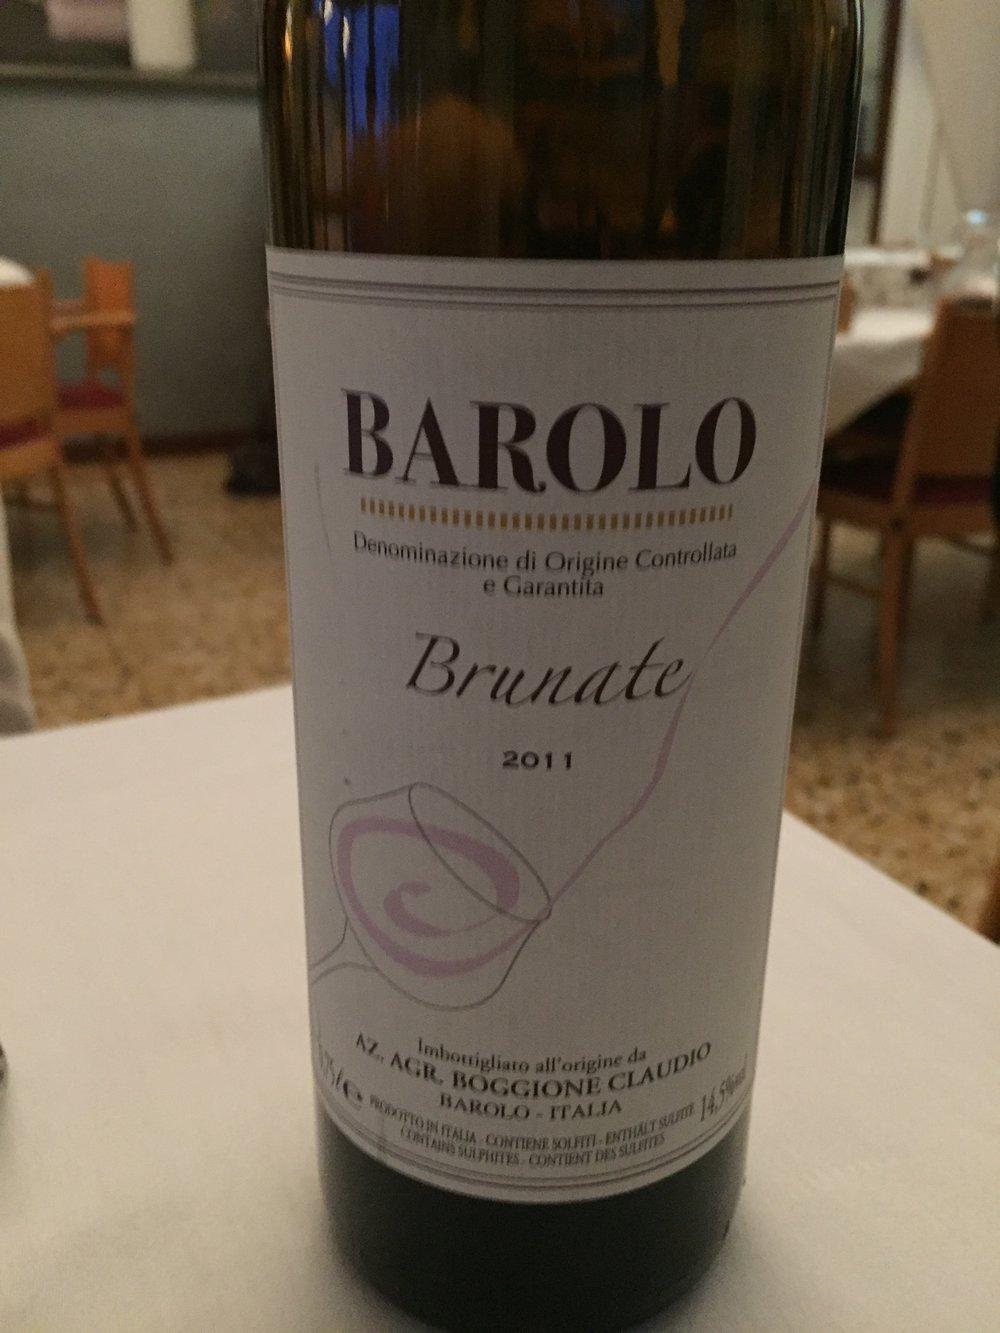 Barolo in Barolo, Italy